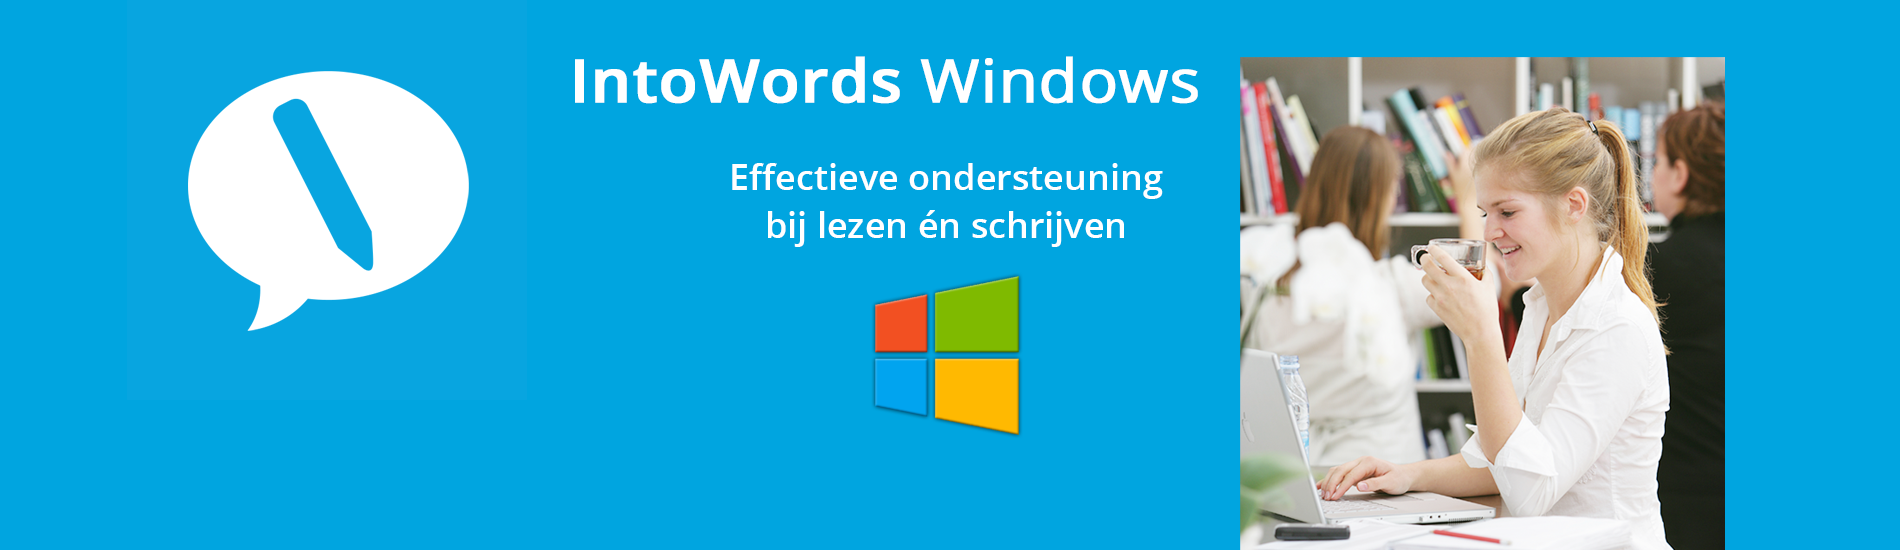 slider intowords windows